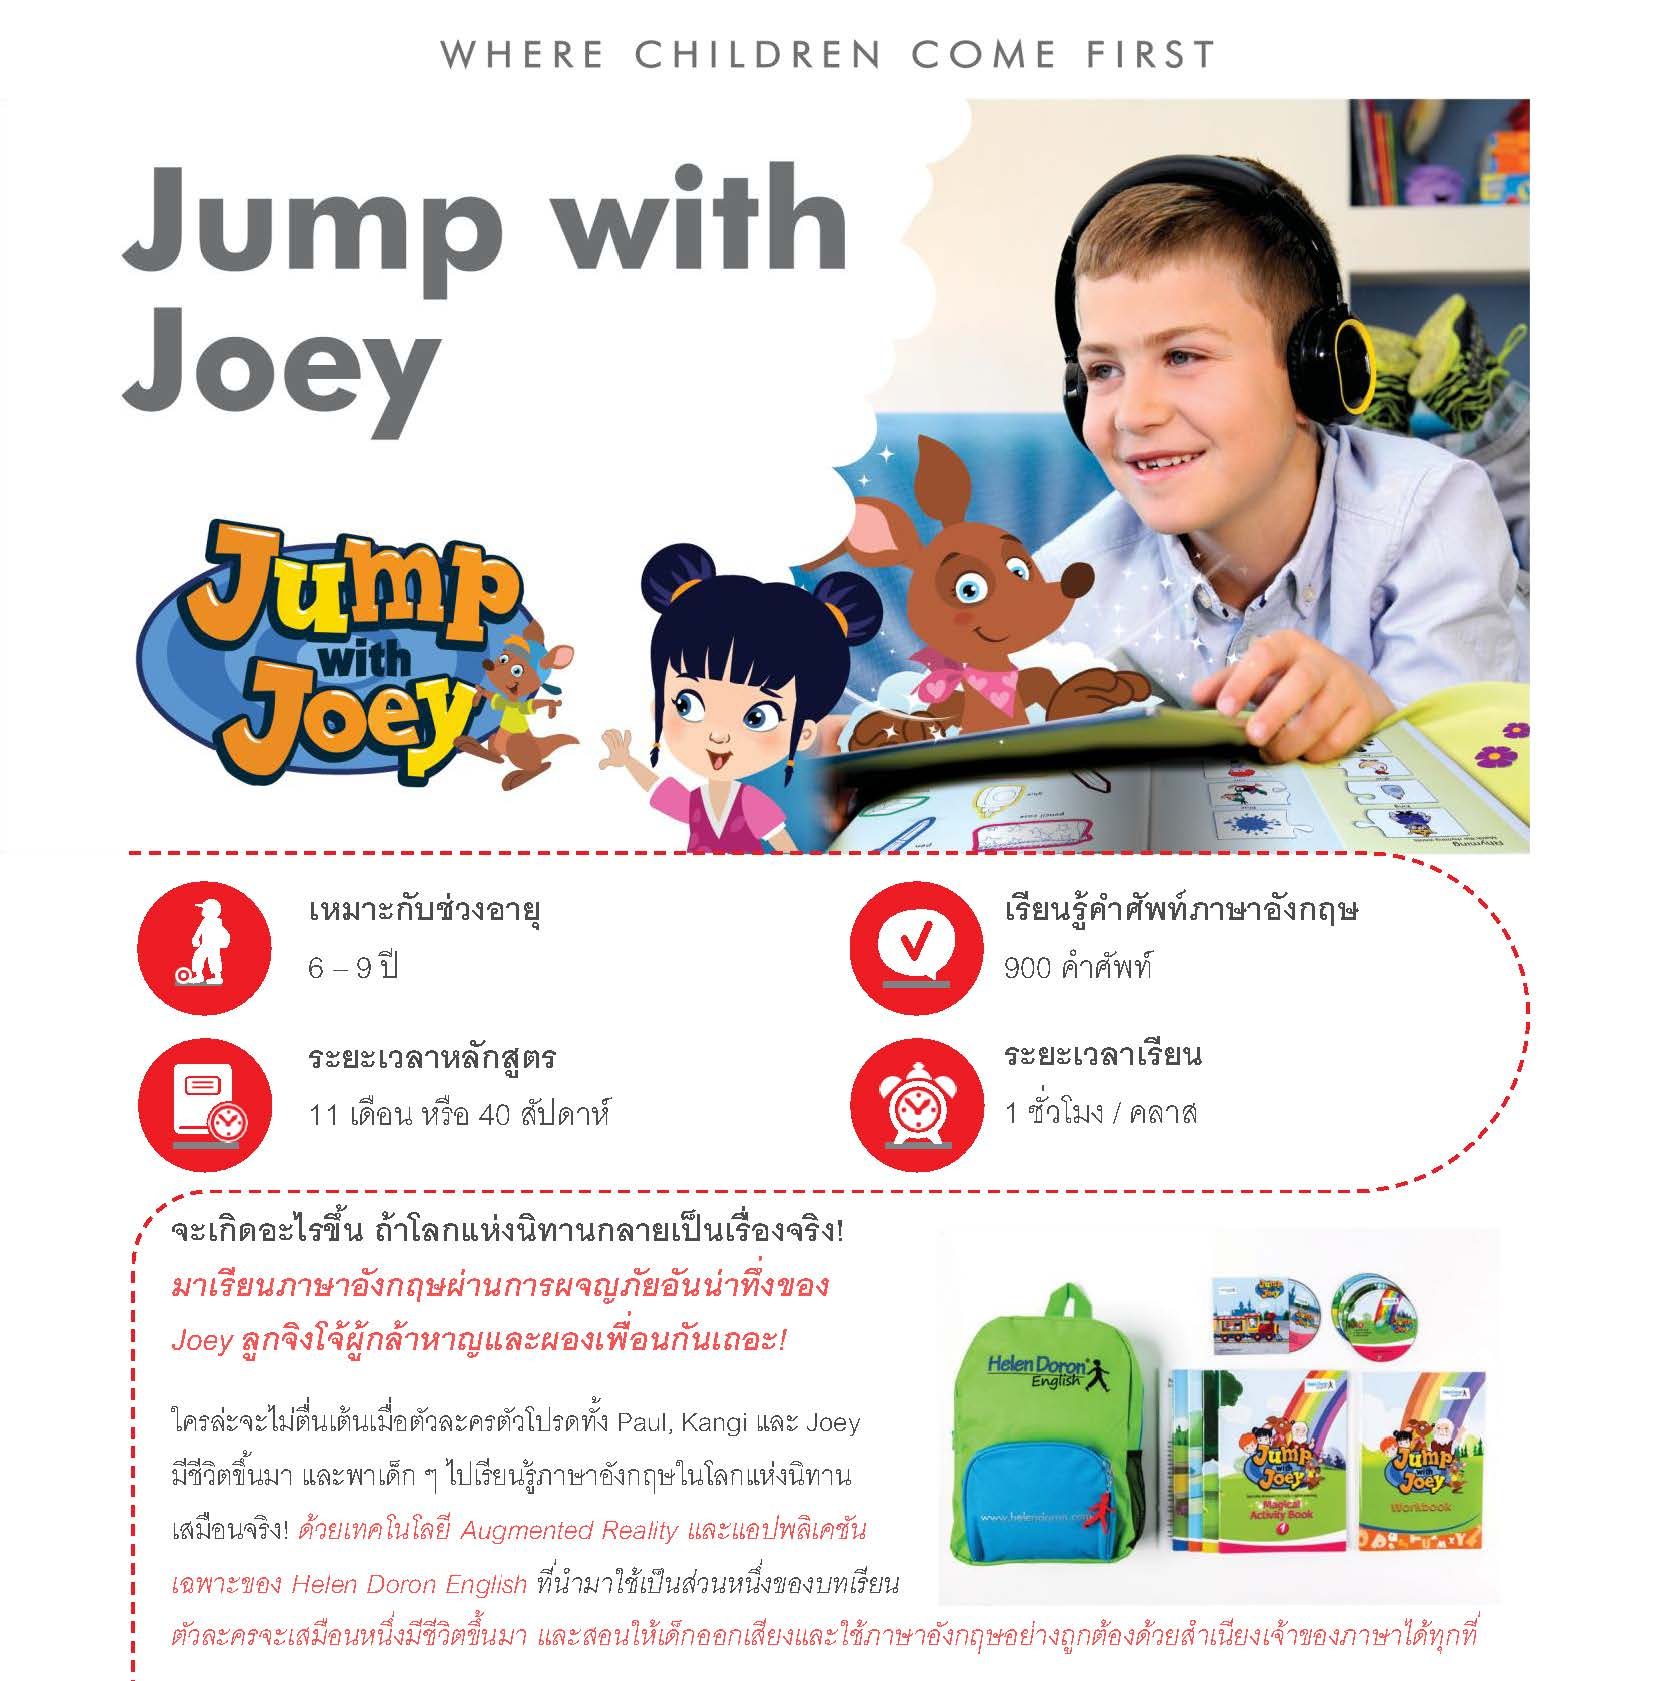 Download - Jump with Joey สำหรับเด็กอายุ 6 – 9 ปี